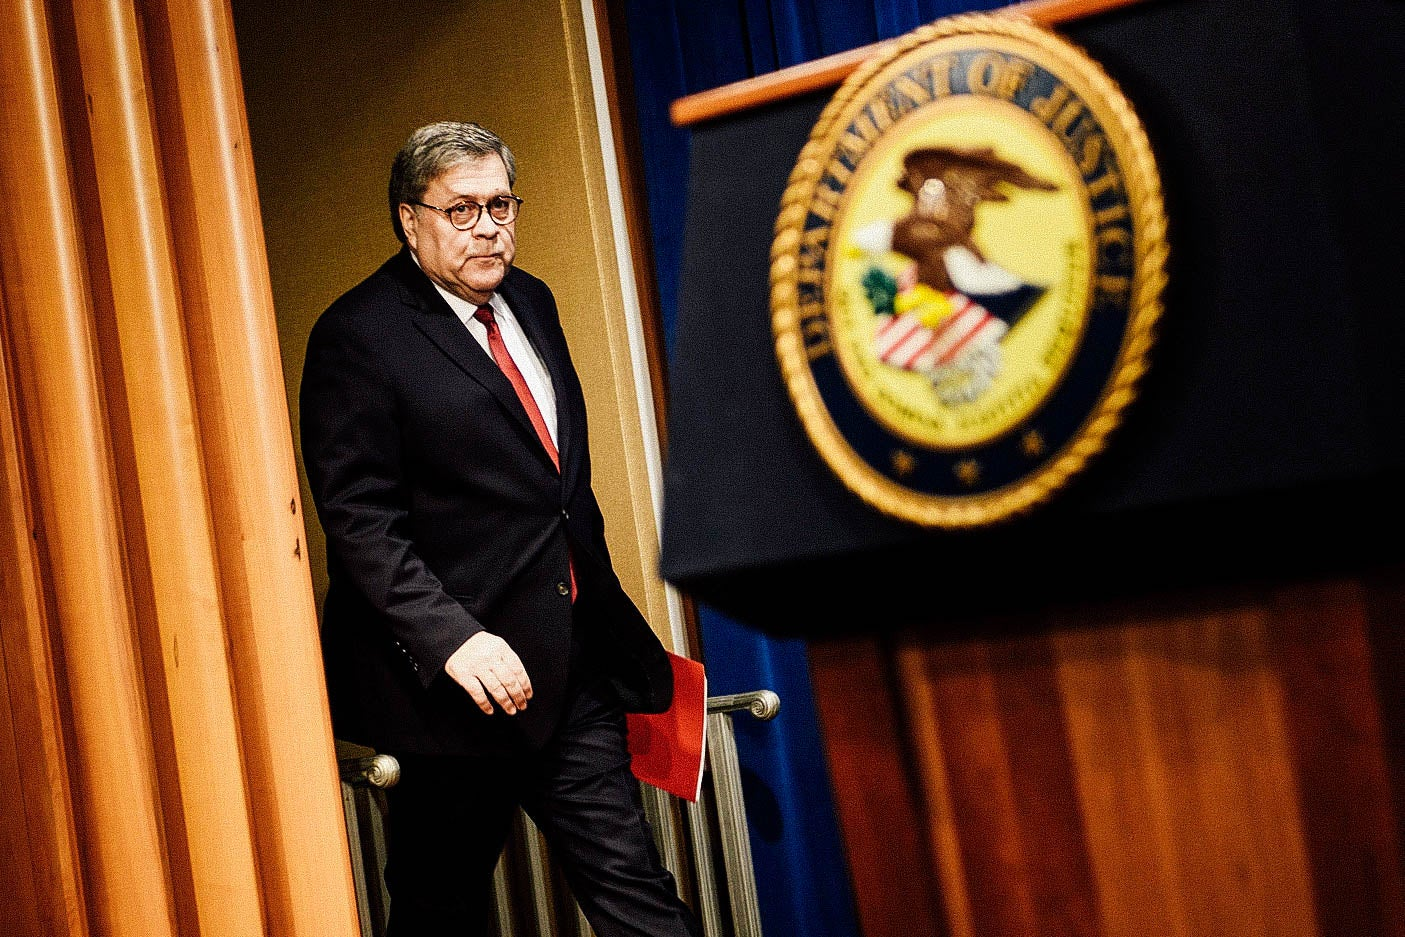 William Barr walks toward a DOJ podium